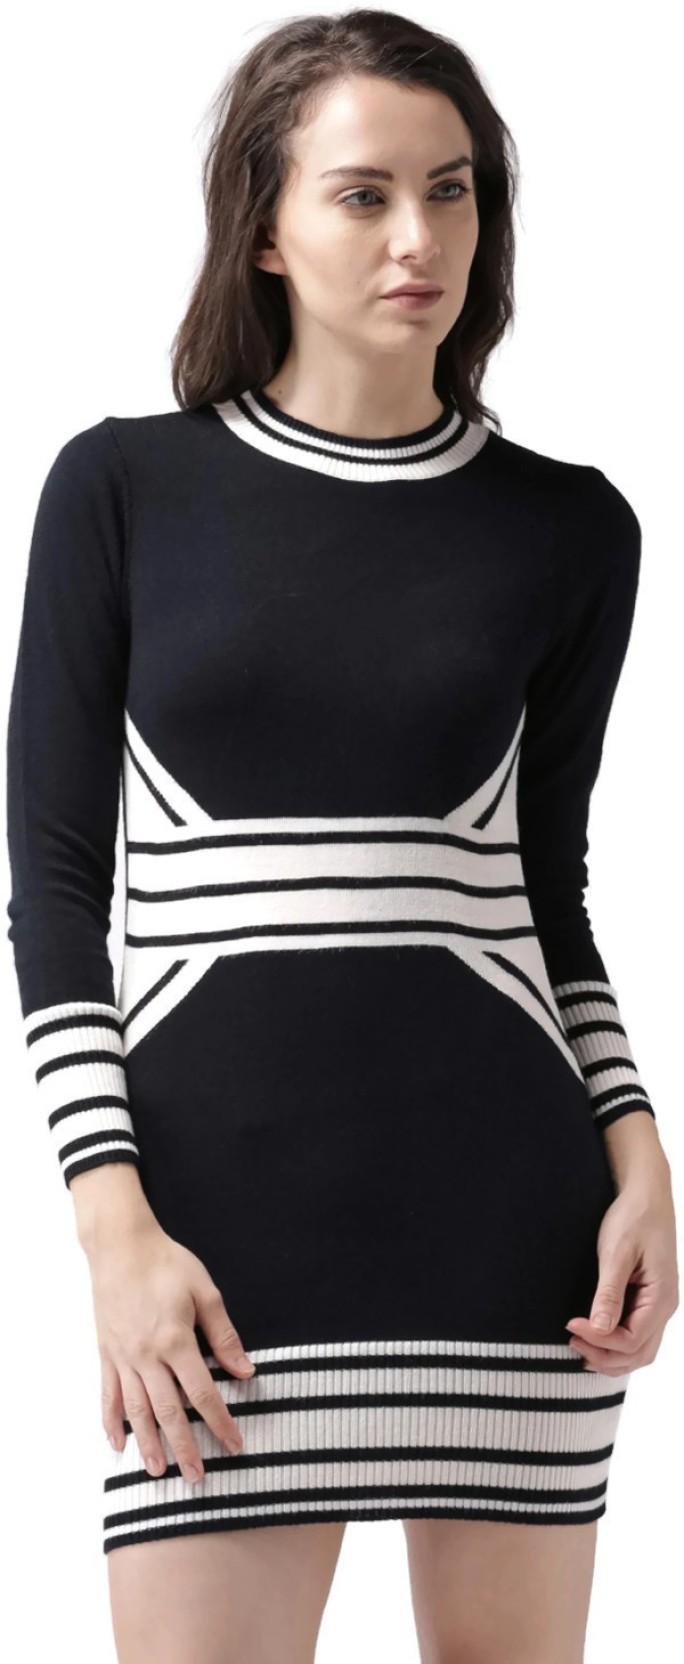 fc61a6e2fafa Mast & Harbour Women's A-line Dark Blue, White Dress. ADD TO CART. BUY NOW